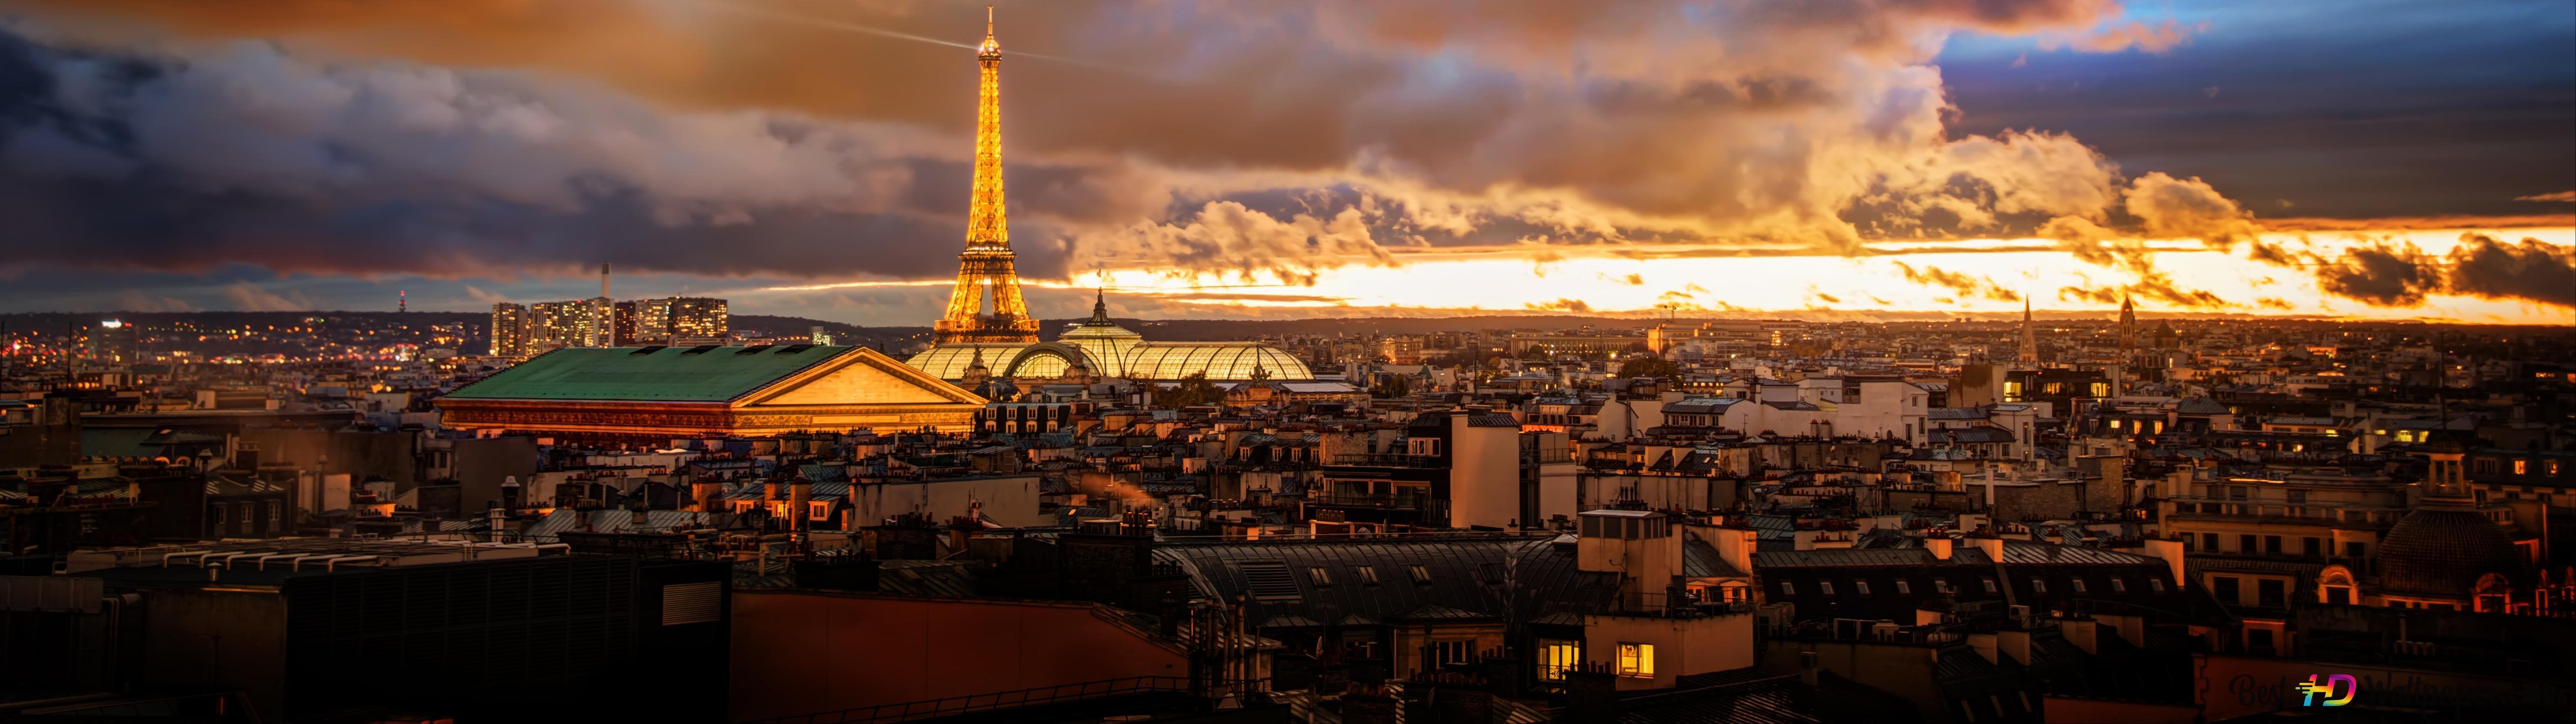 Sunset Over Paris Hd Wallpaper Download